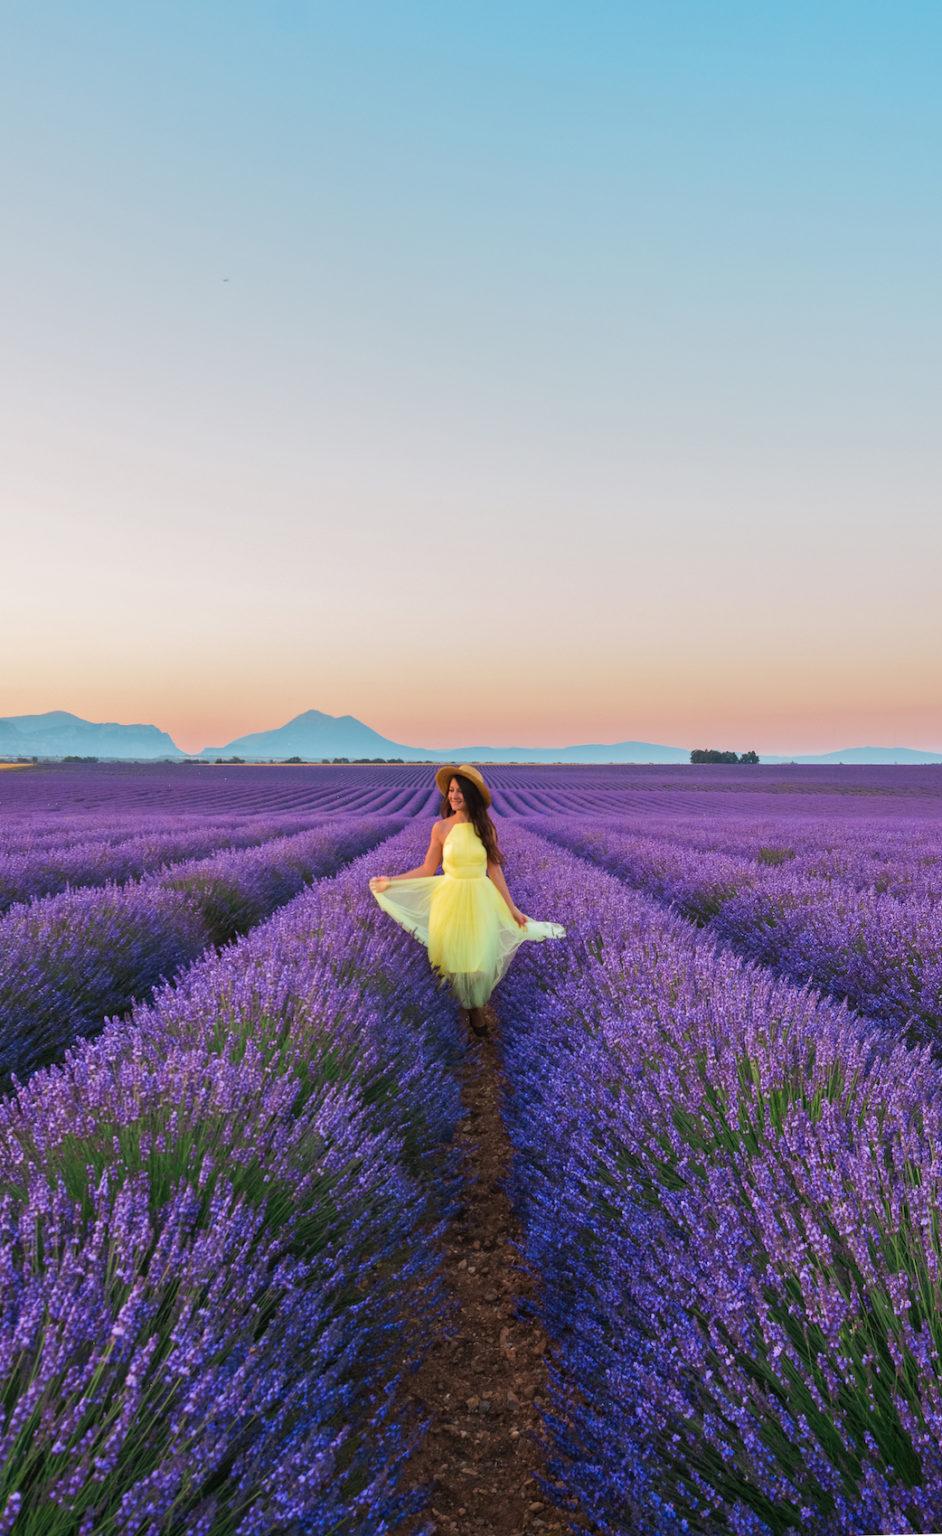 Sunrise and lavender field